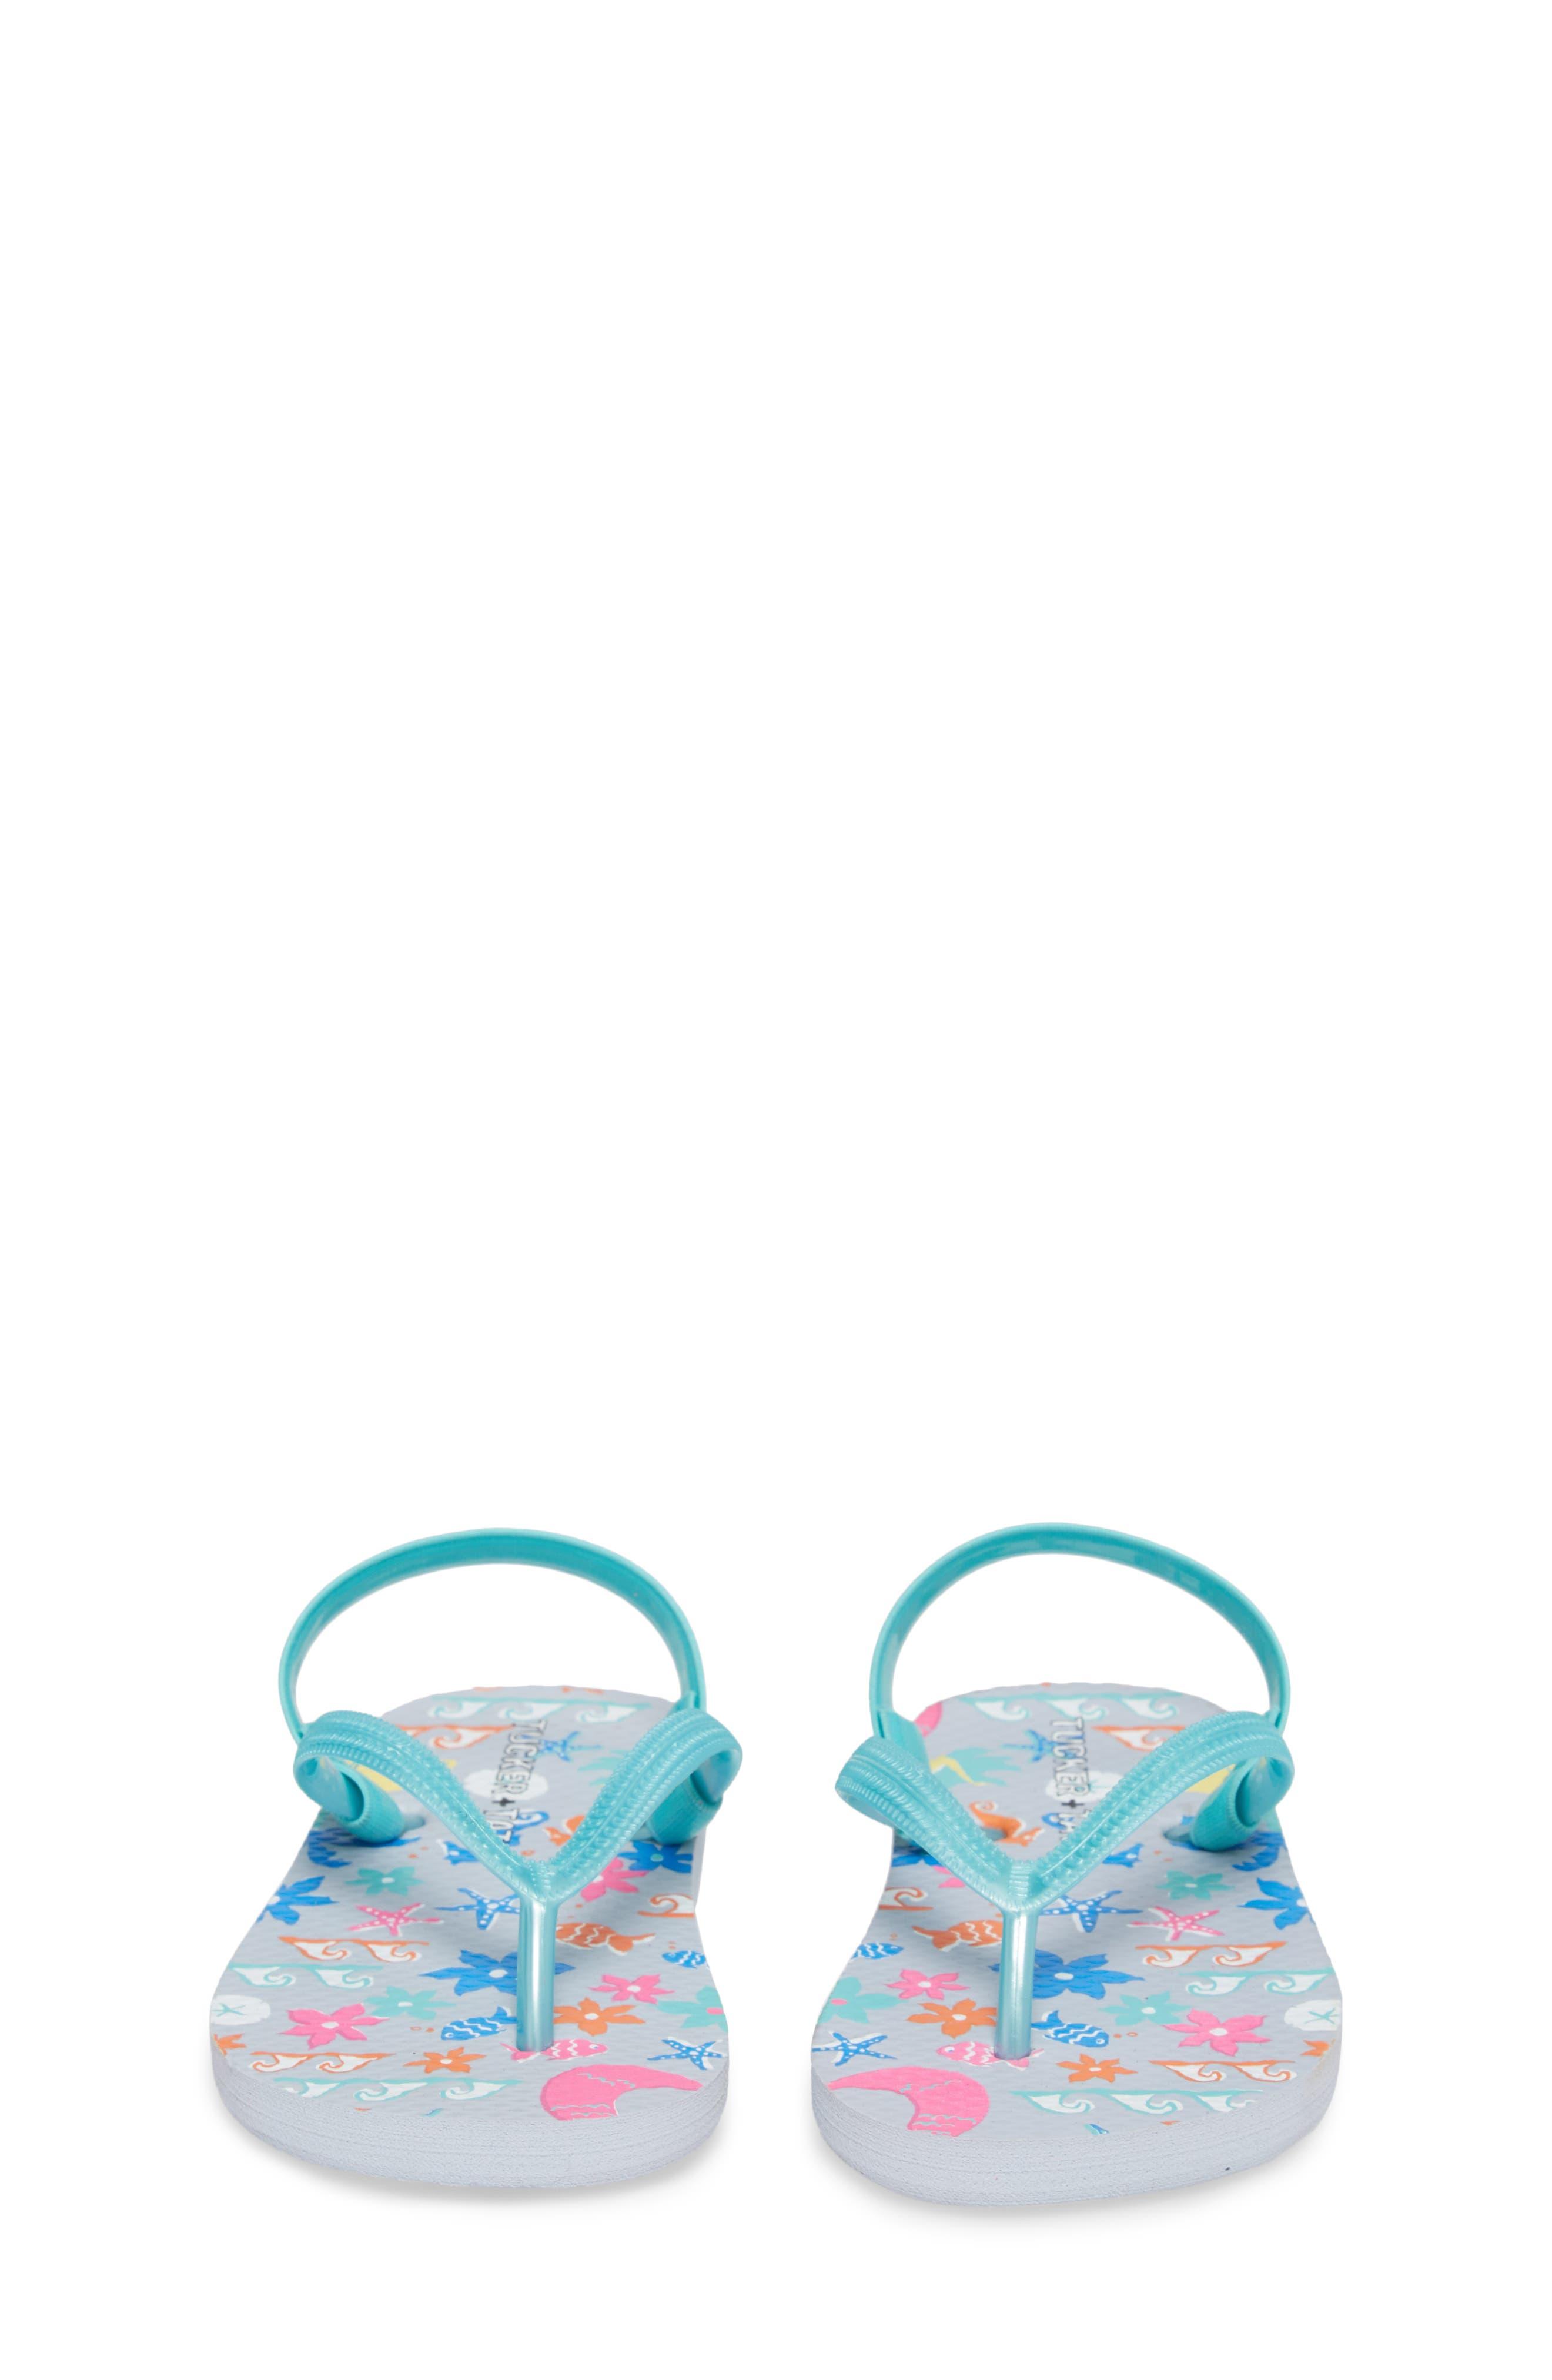 Annabelle Flip Flop,                             Alternate thumbnail 5, color,                             Turquoise Mermaid